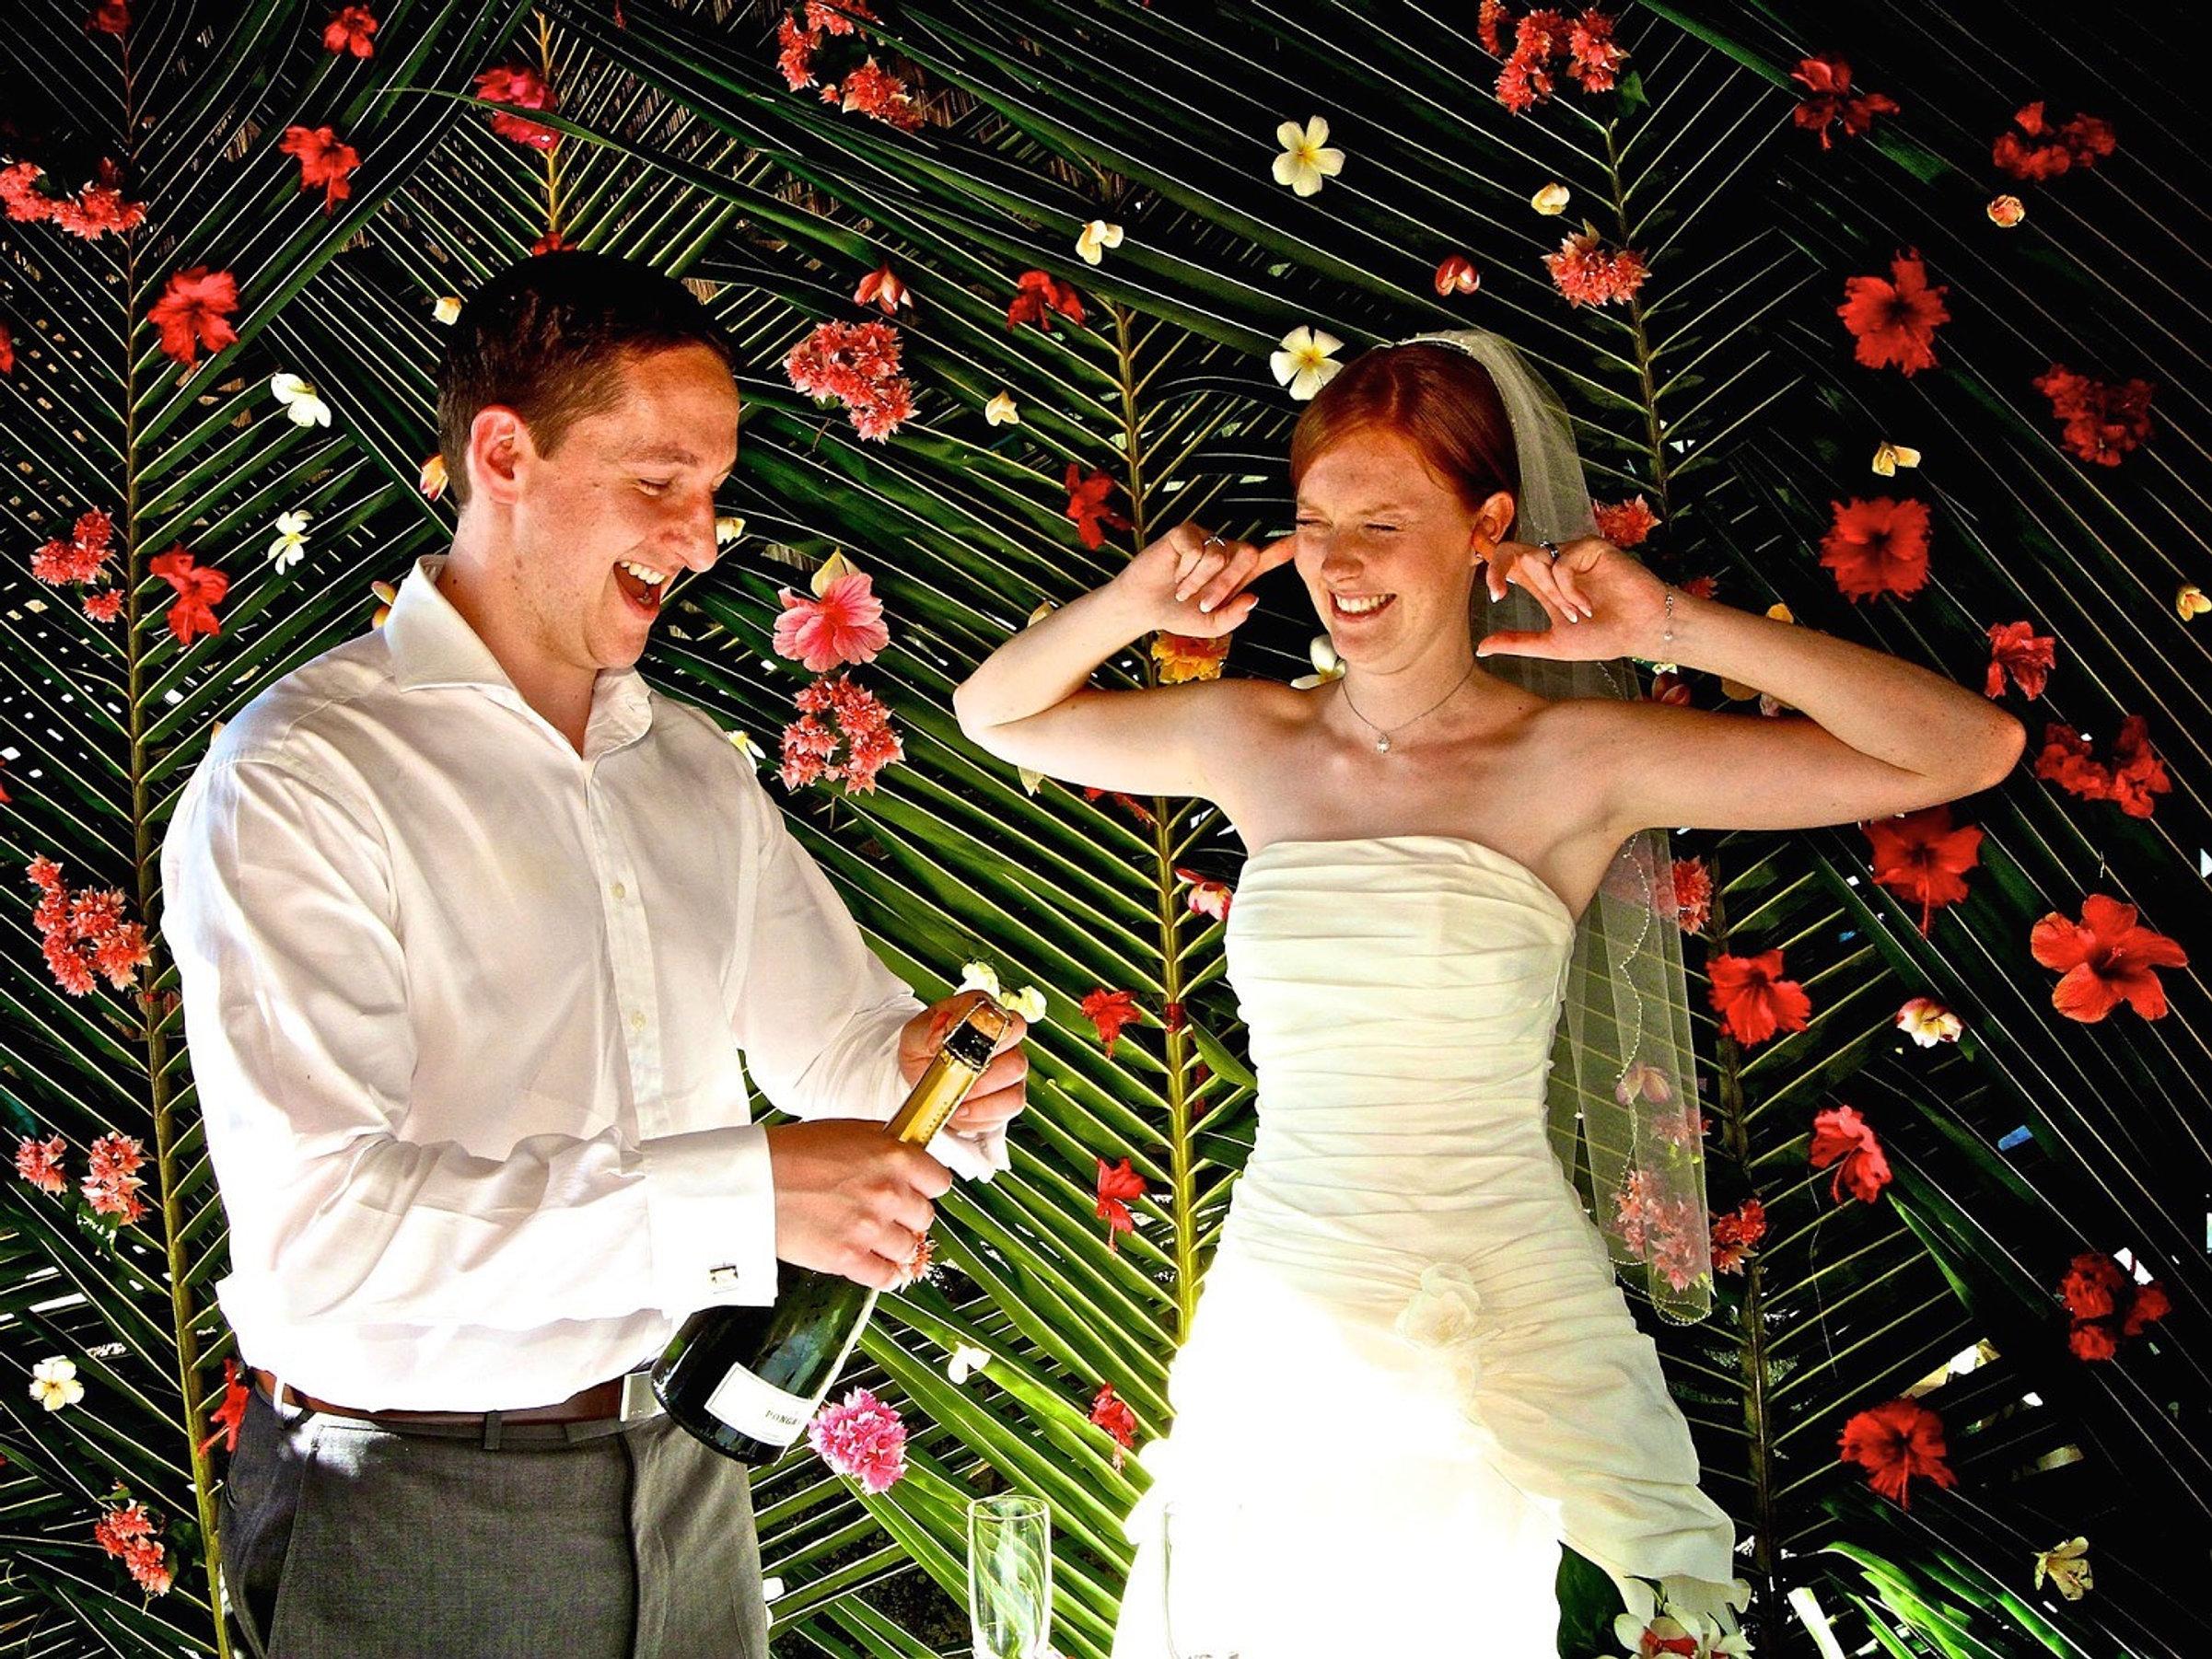 photographe talentueux aux seychelles levy laurent mariage aux seychelles - Photographe Mariage Seychelles